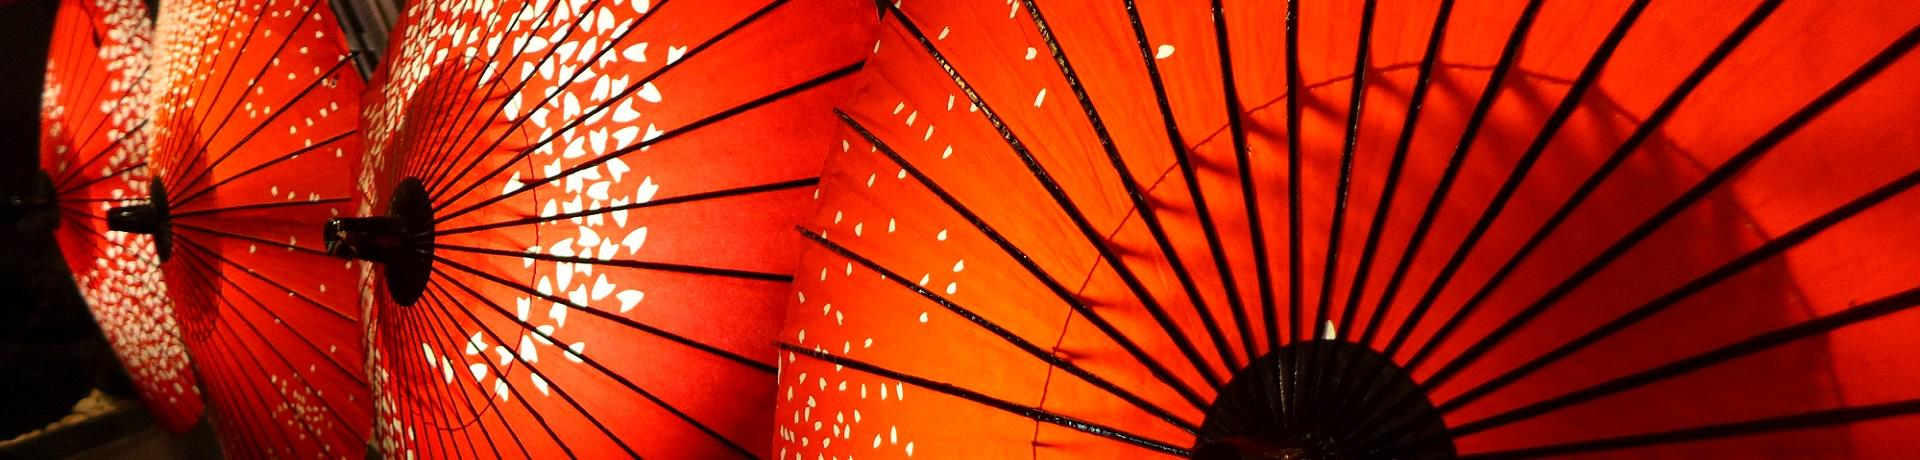 Japan: Schirme - Emotion (CR)